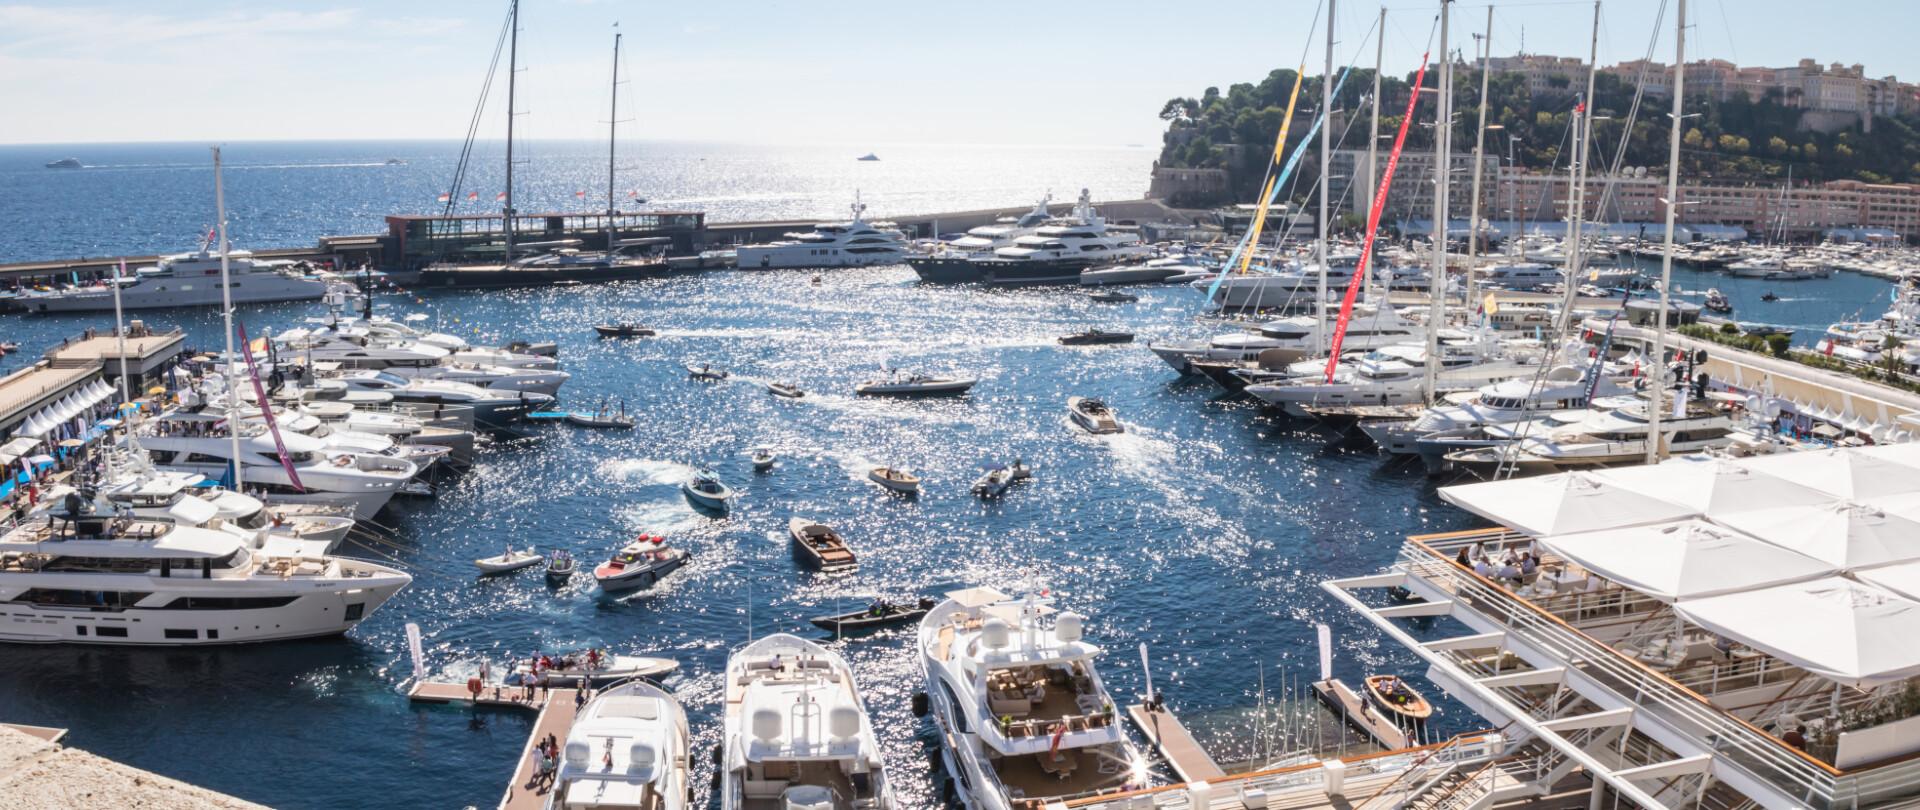 Monaco Yacht Show 2017 | Fleet Update photo 1